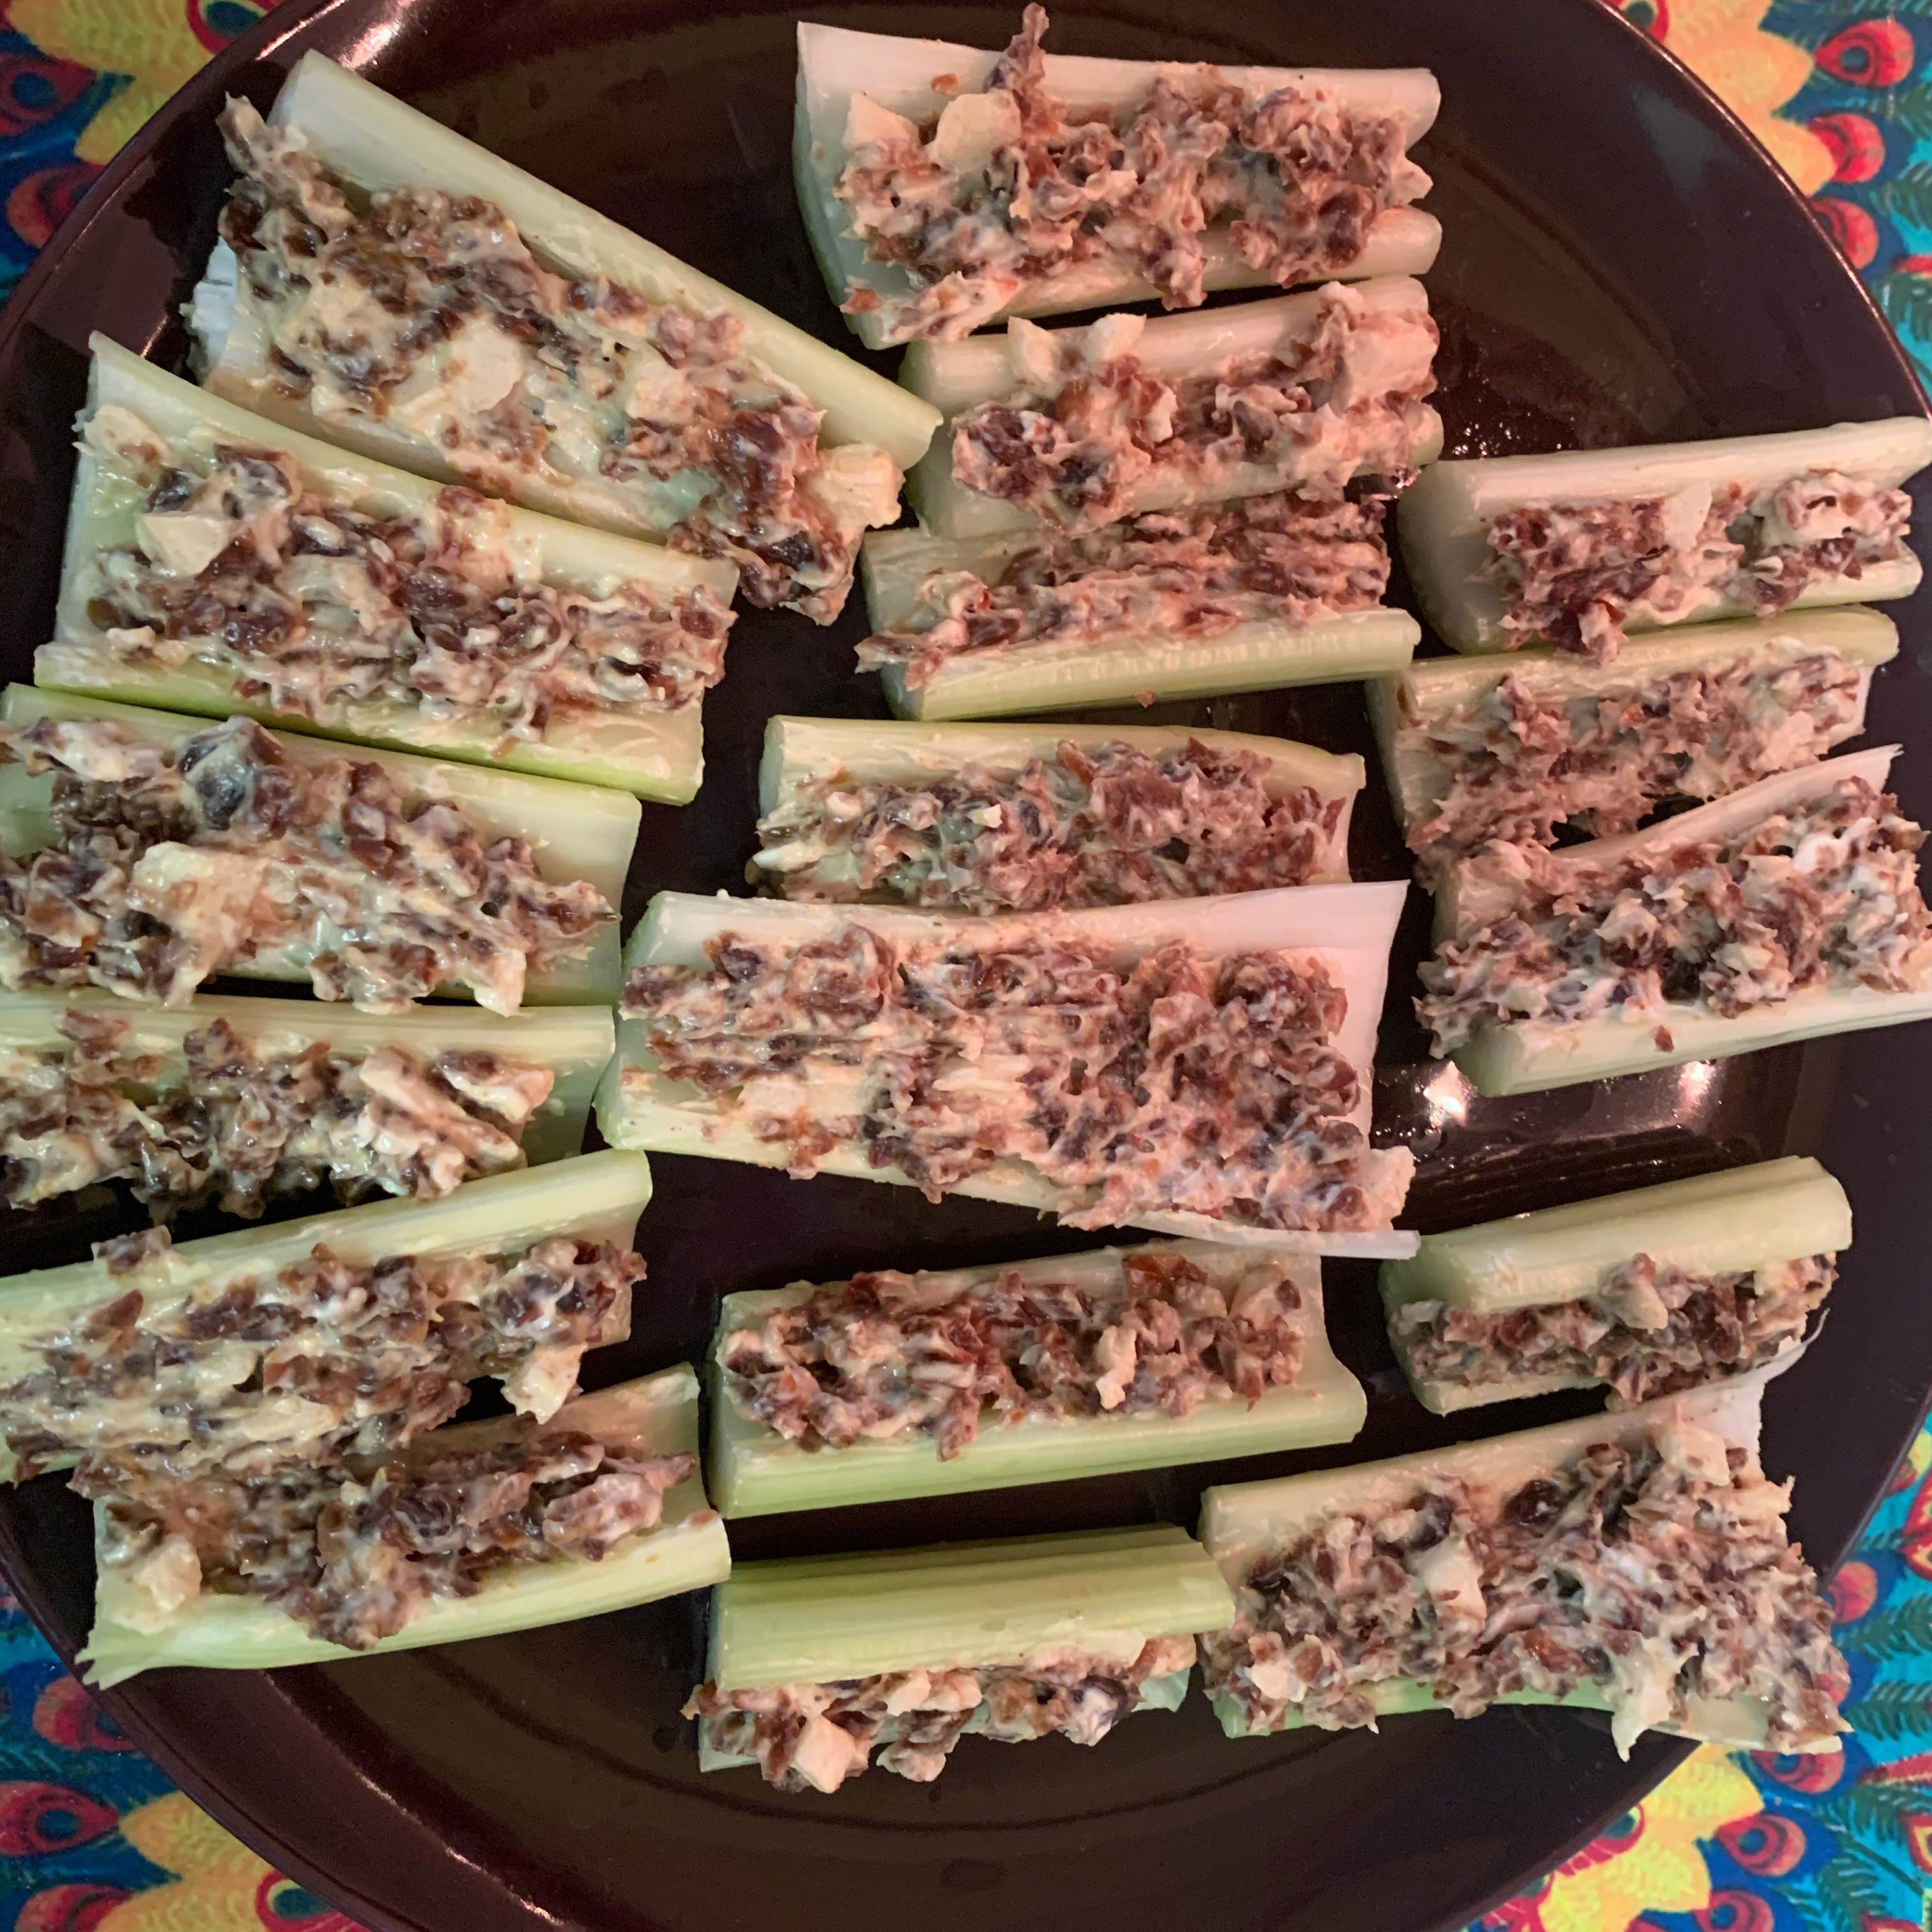 Curried Celery ArianneReagor